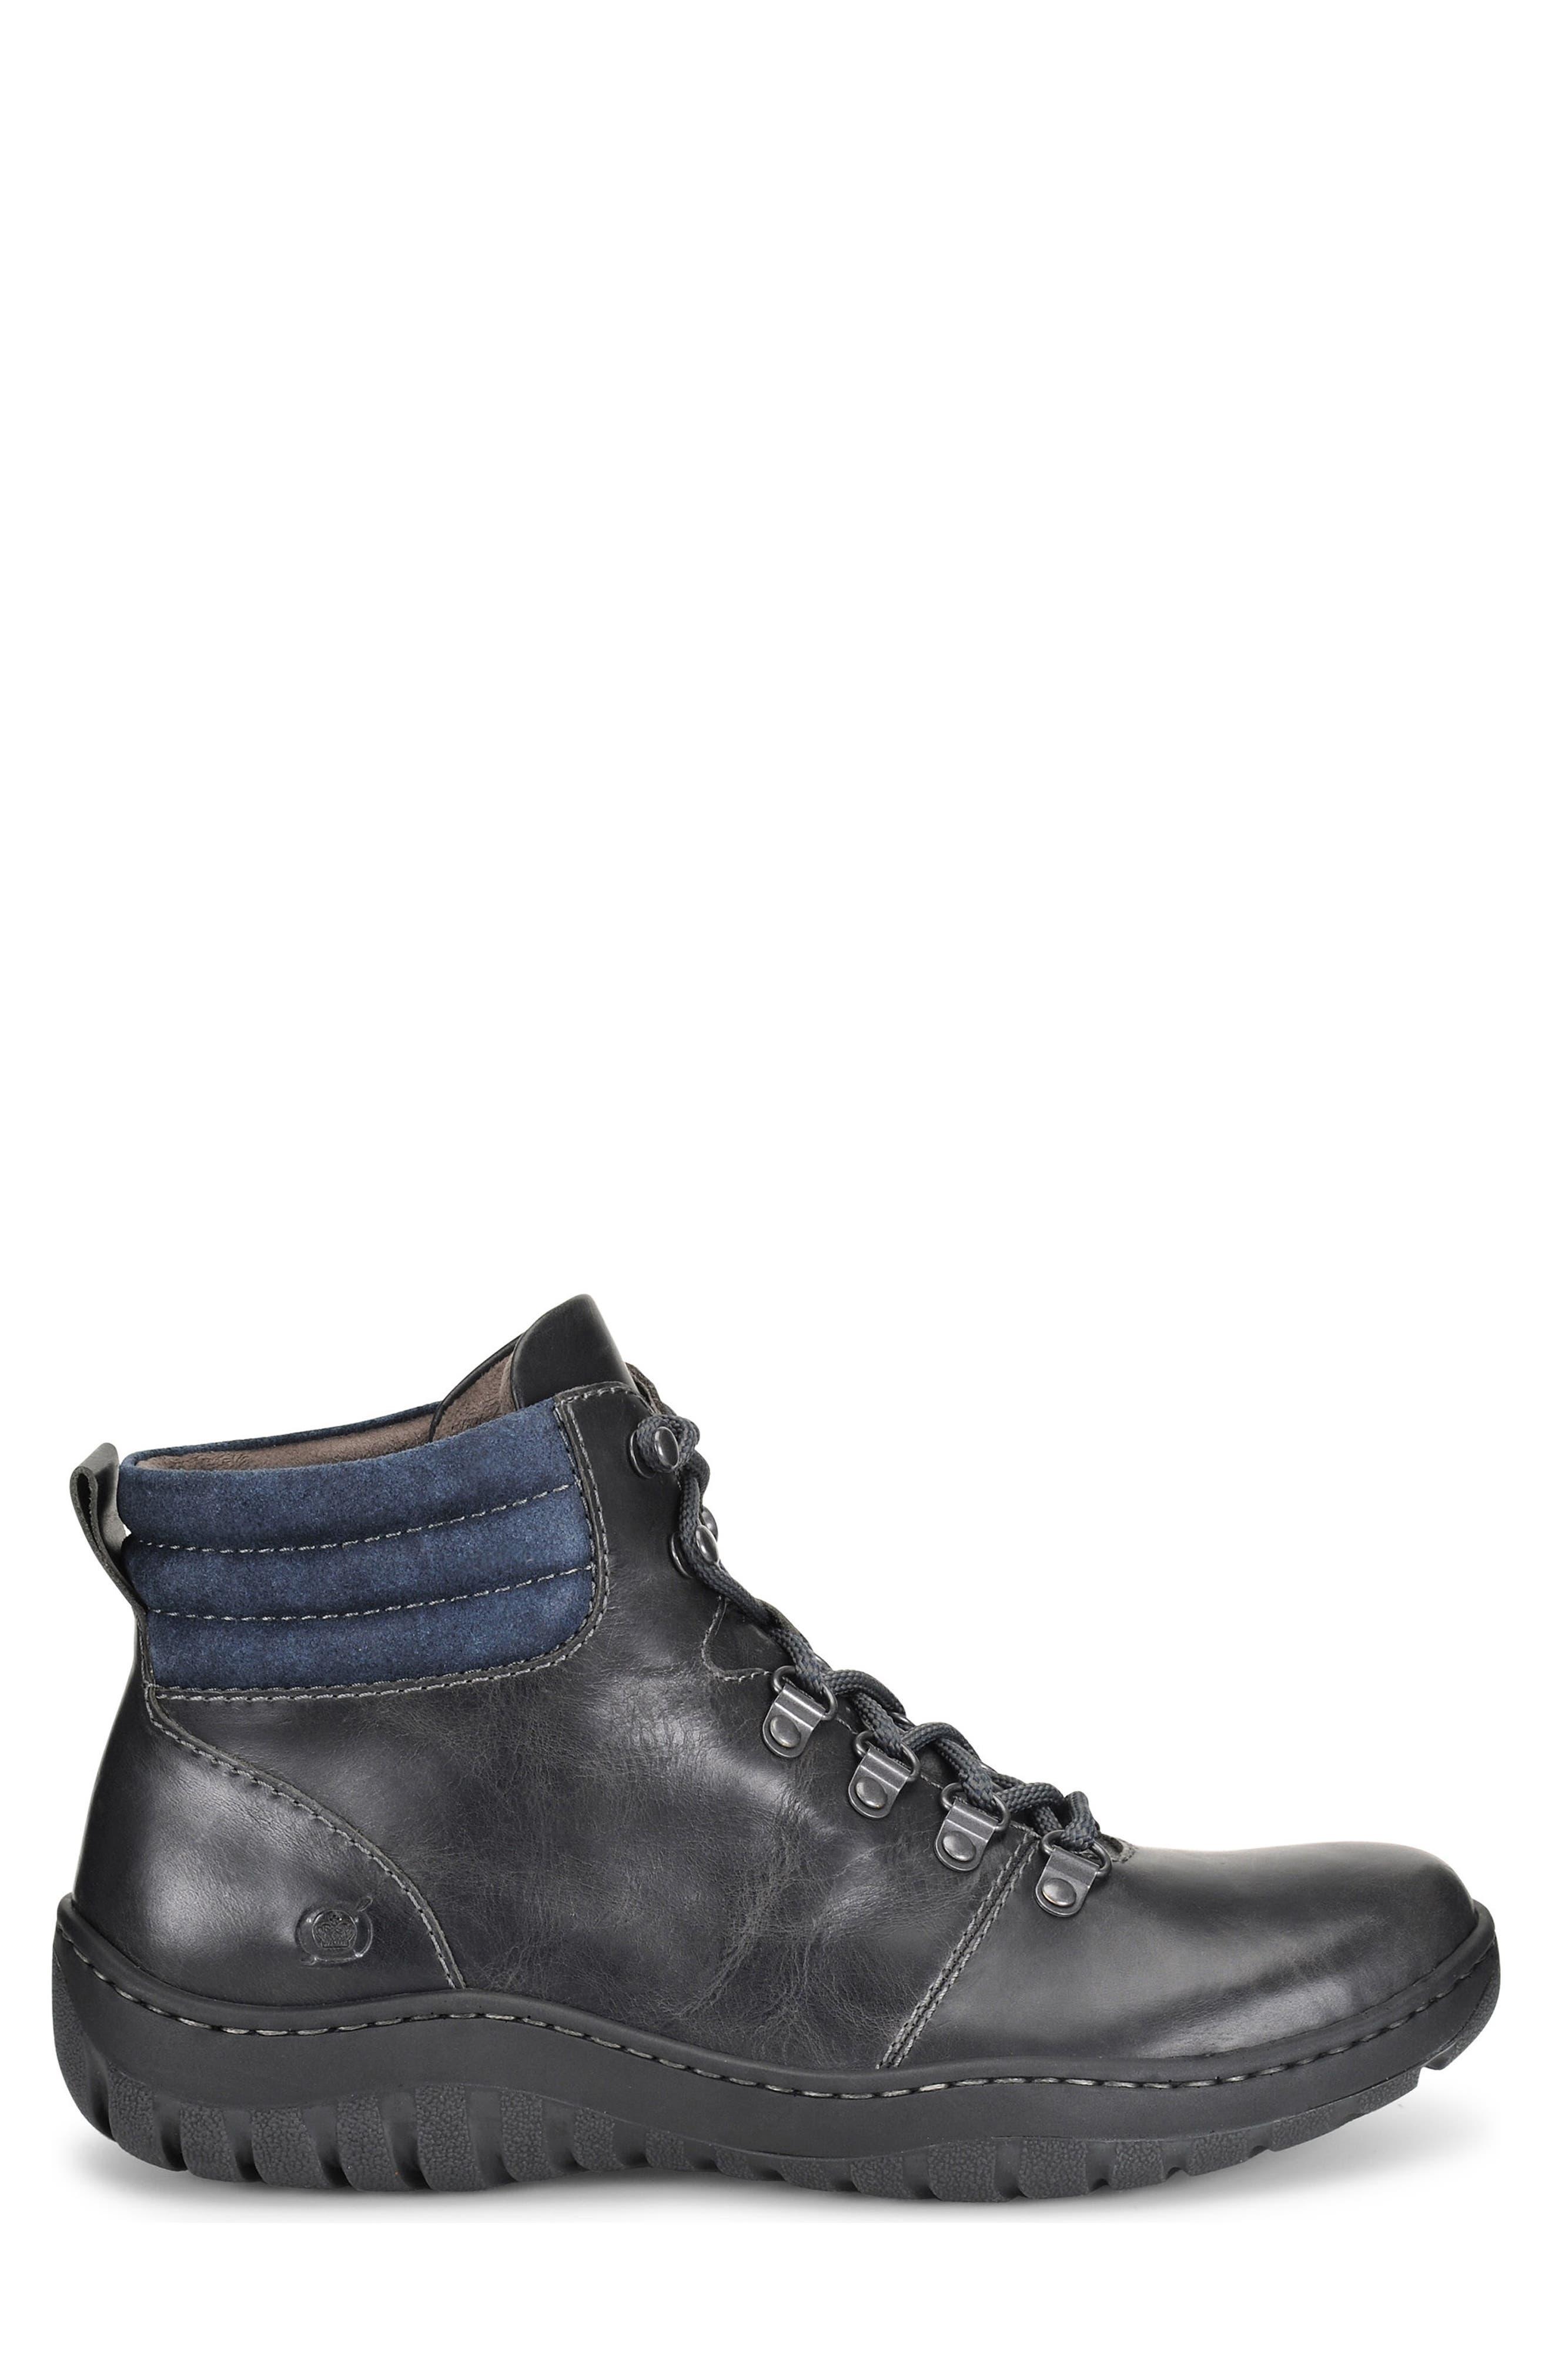 Dutchman Plain Toe Boot,                             Alternate thumbnail 3, color,                             DARK GREY/ BLUE